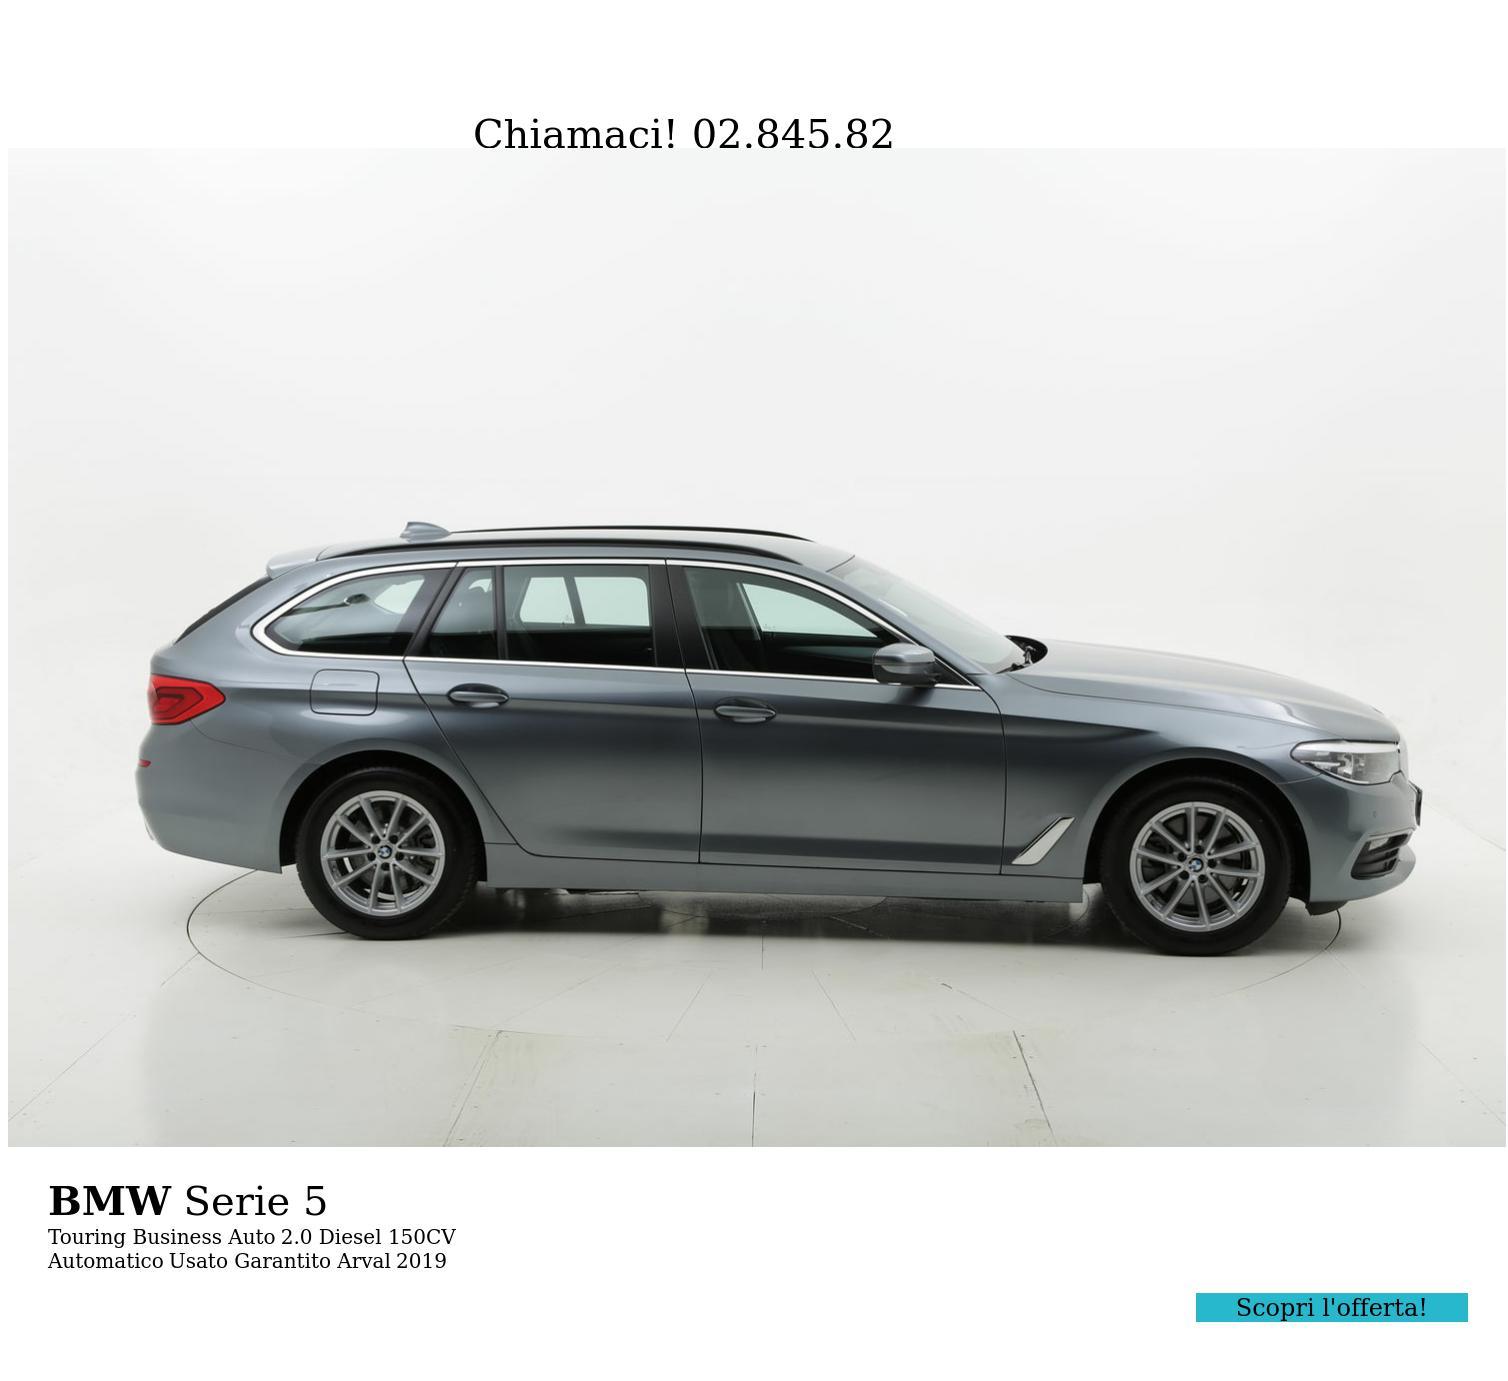 BMW Serie 5 touring business auto km 0 diesel antracite | brumbrum